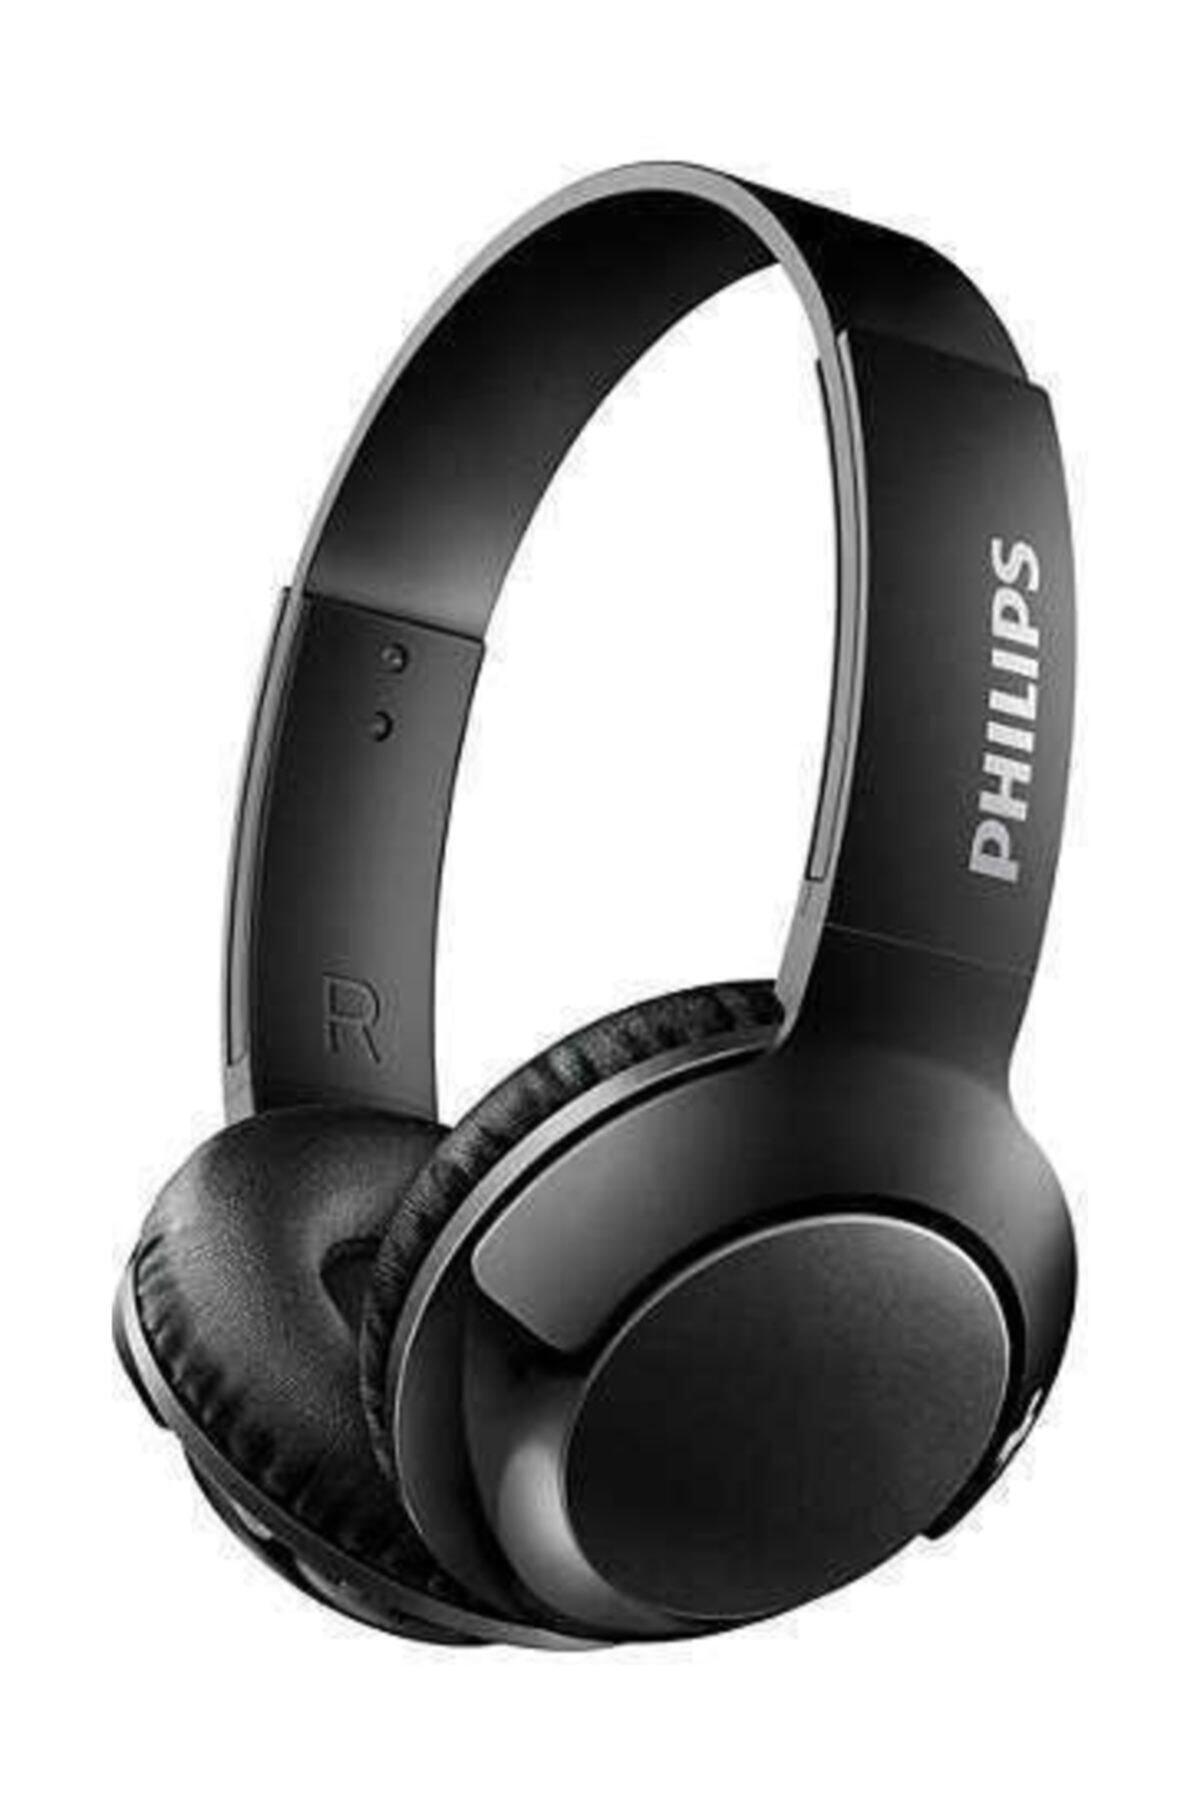 SHB3075BK/00 BASS+ Mikrofonlu Bluetooth Kulaklık - Siyah